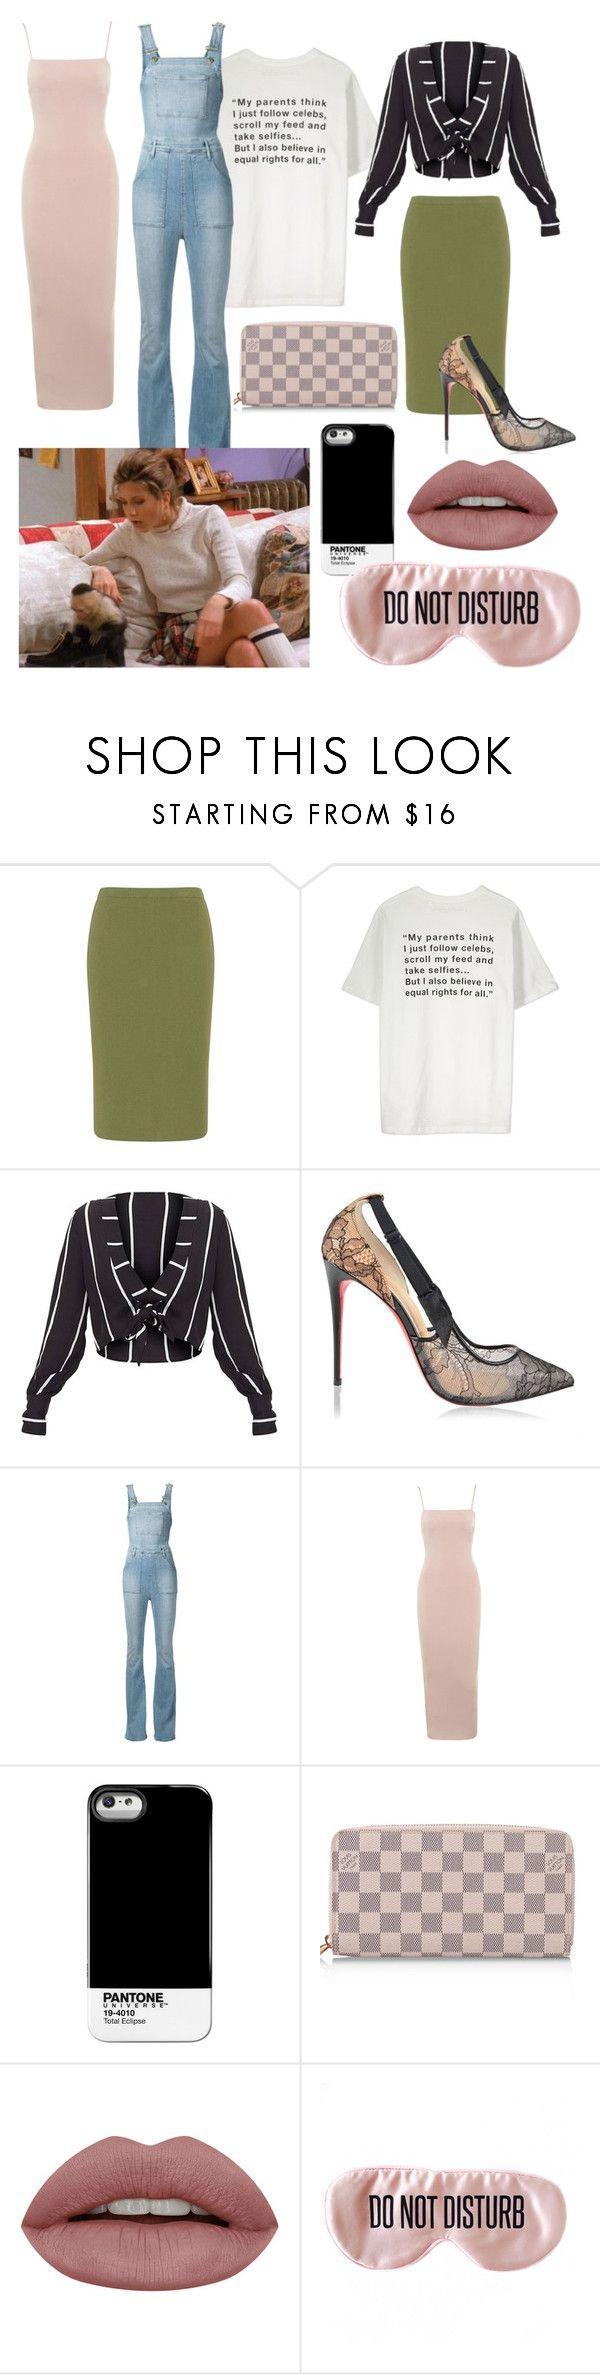 """Rachel Green - First set"" by julianamorgado1918 on Polyvore featuring Isolde Roth, Christian Louboutin, Frame, Pantone Universe, Louis Vuitton e BaubleBar"